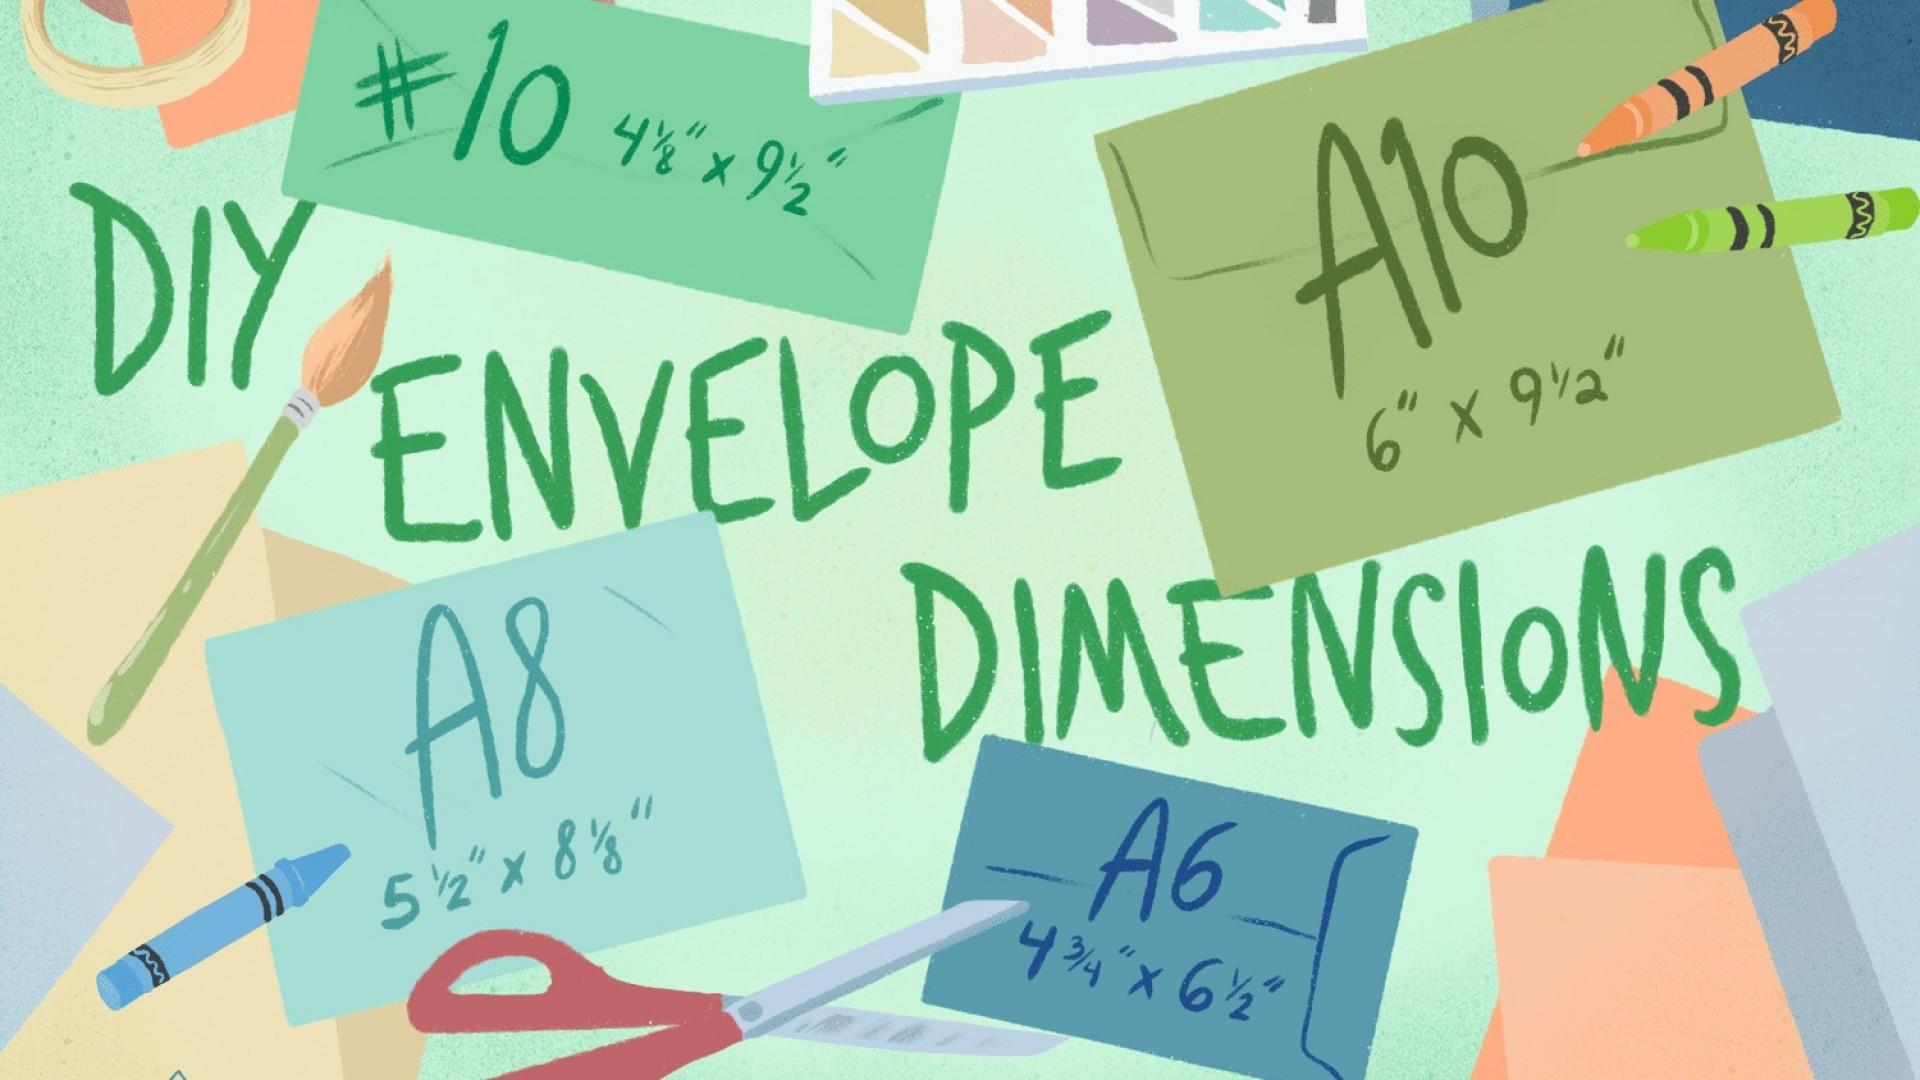 009 Stupendou 5x7 Envelope Template Word Image  Microsoft Free1920